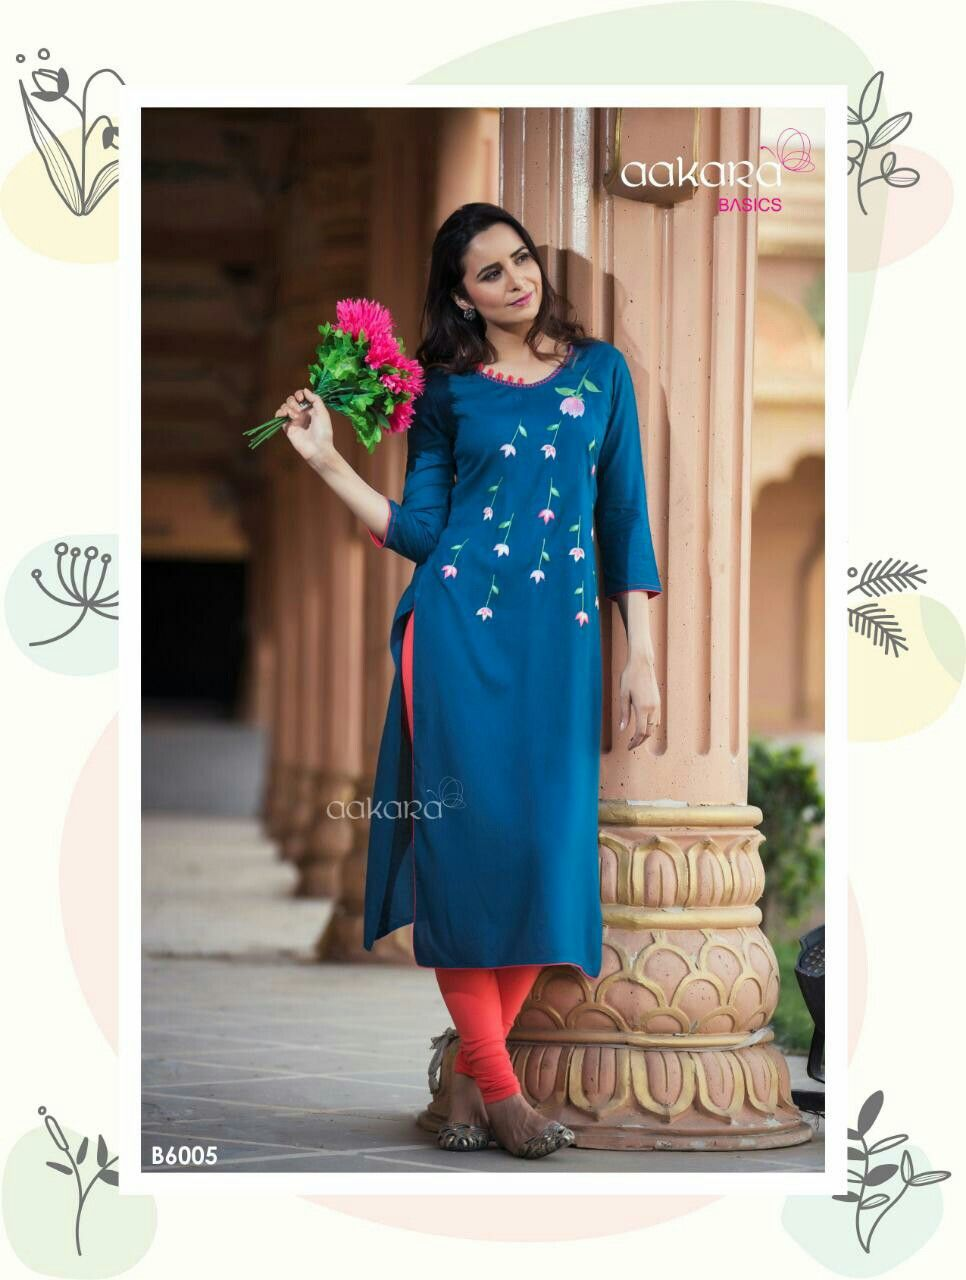 for Order or inquiry call or wap+917874851648#ootd #weddingwear #kurtisonline #blousedesigns #dressmaterial #indianbride #kurtilove #ethnicwear #designerclothes #kurtisconner #kurticrepe #designerkurtis #kurtimalaysia #indiancouture #chennai #wedding #kurticantik #partywear #desiwedding #kurtas #kurtishaj #kurtiwholesale #indianweddingbuzz #weddingsofinstagram #pakistanisuits #bridalentry #ratibeauty #goldjewellery #salwar #weddinglehenga